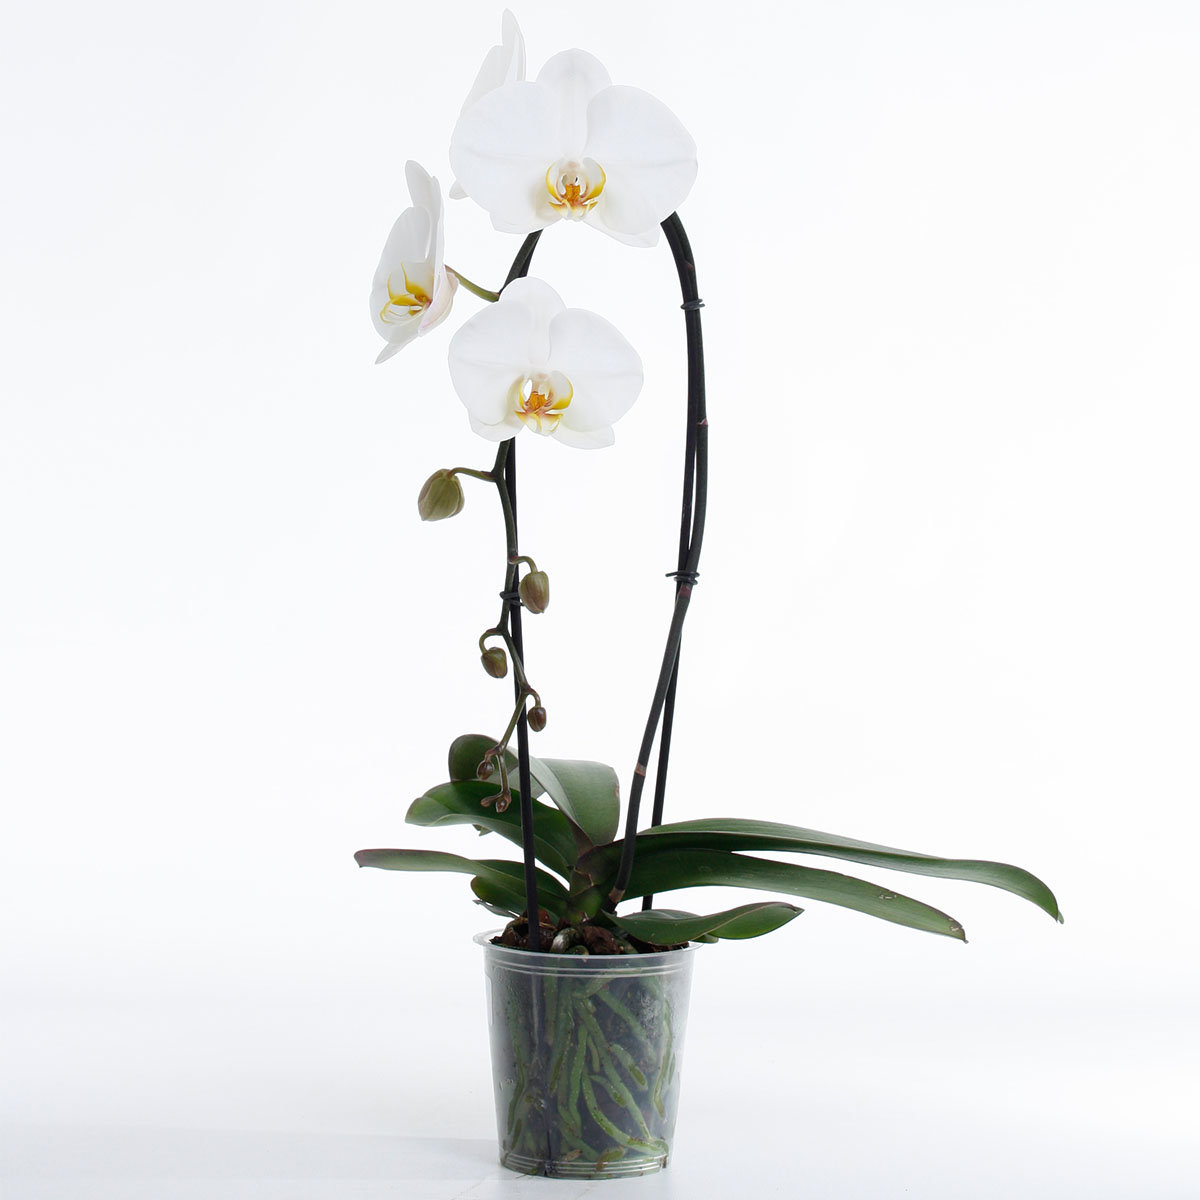 wei e schmetterlings orchidee cascade online kaufen bei g rtner p tschke. Black Bedroom Furniture Sets. Home Design Ideas